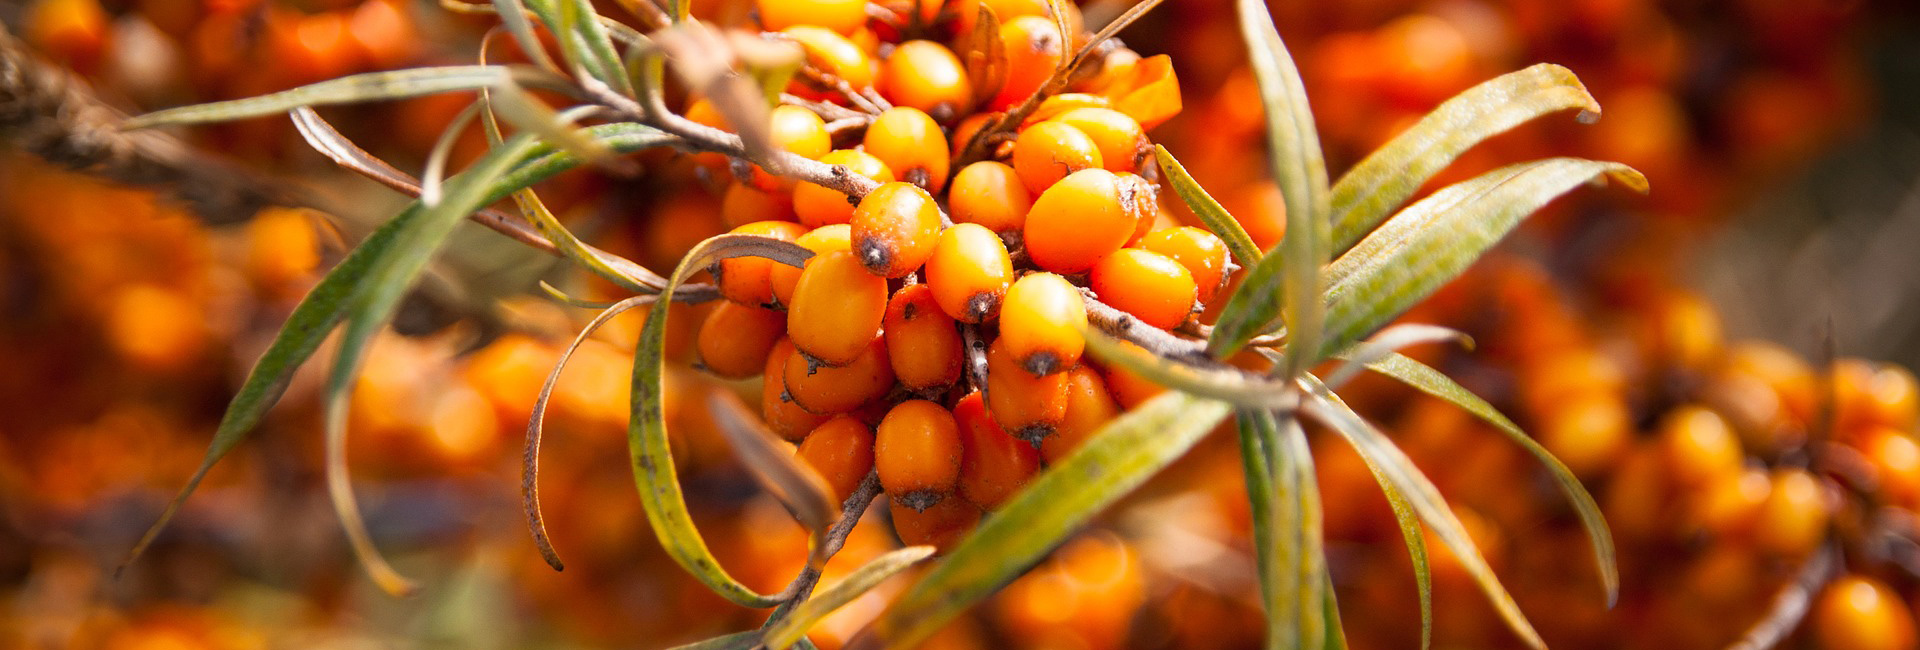 Duindoornbes--vitamineA-Membrasin